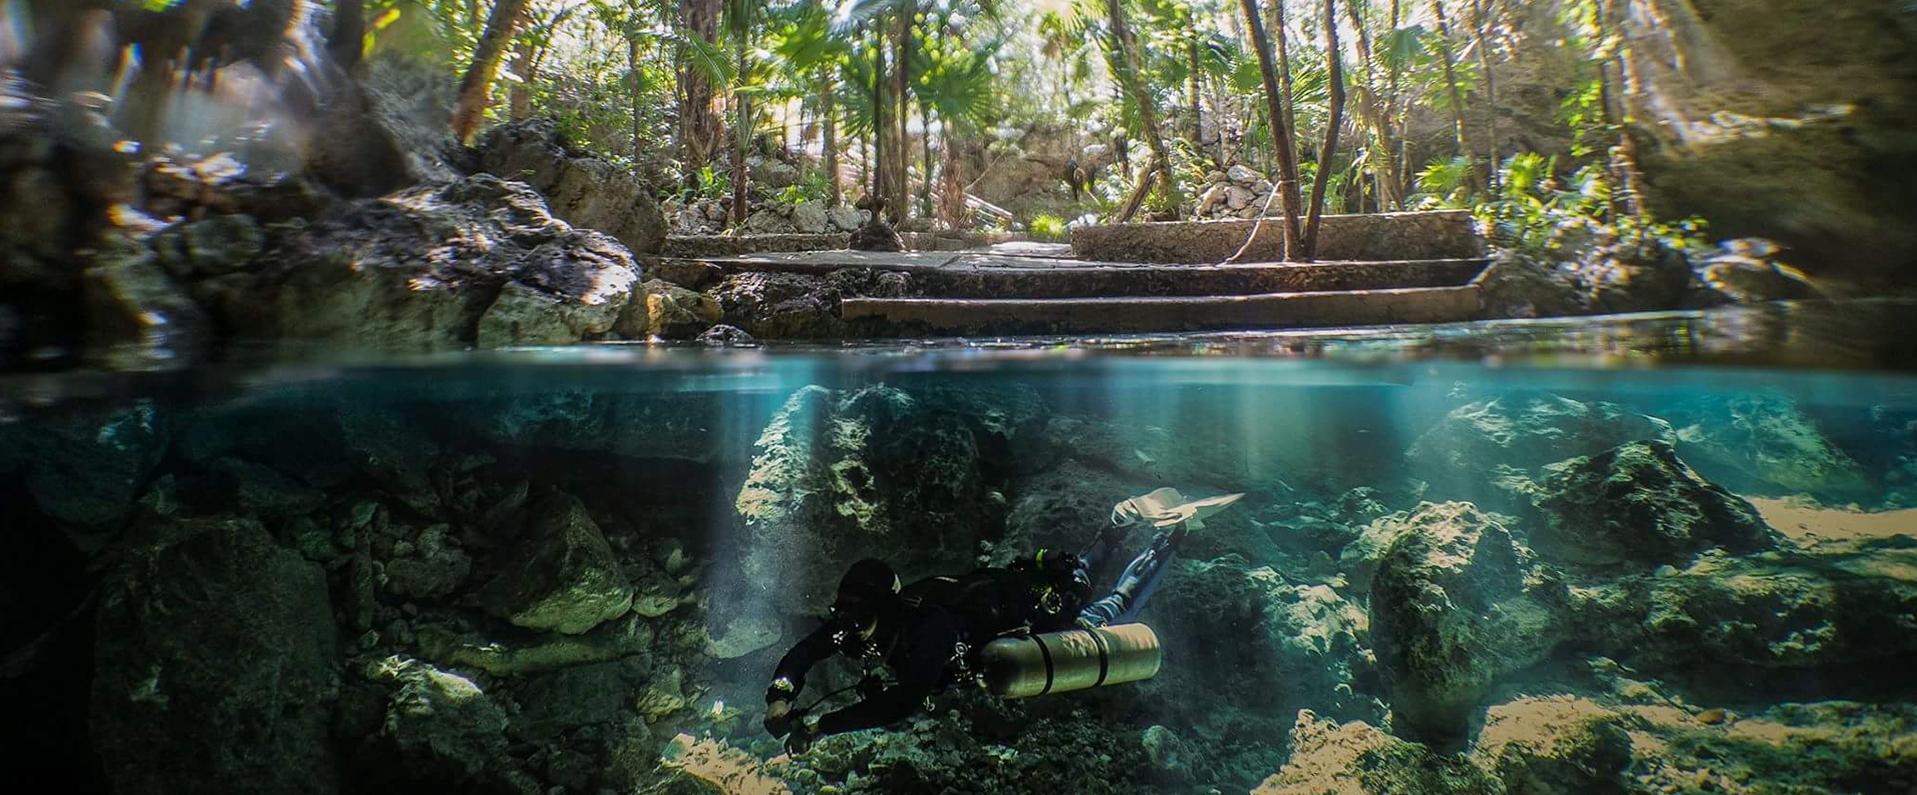 Half underwater photo of diver in cenote